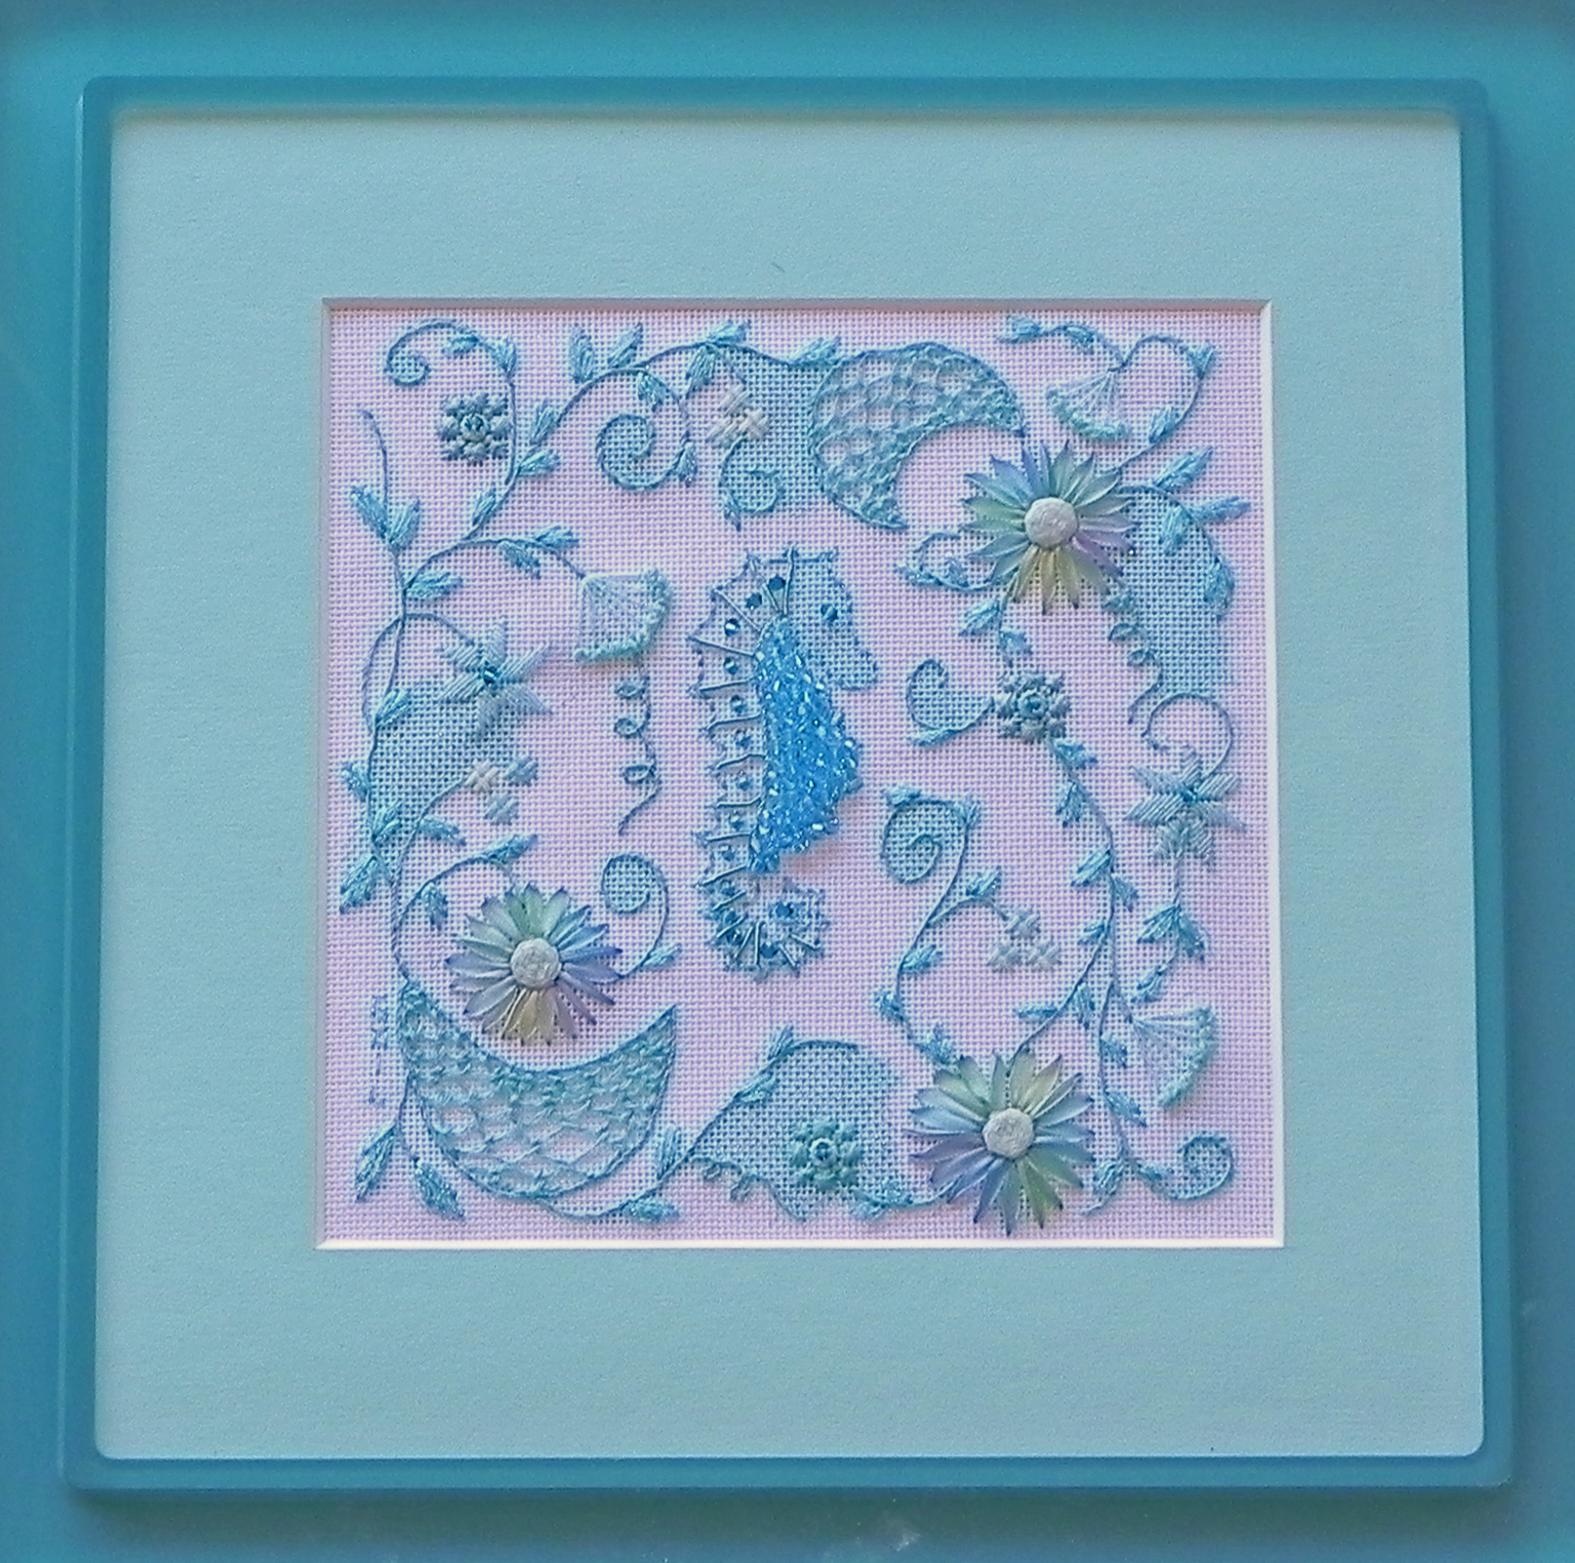 Artistry in Aqua